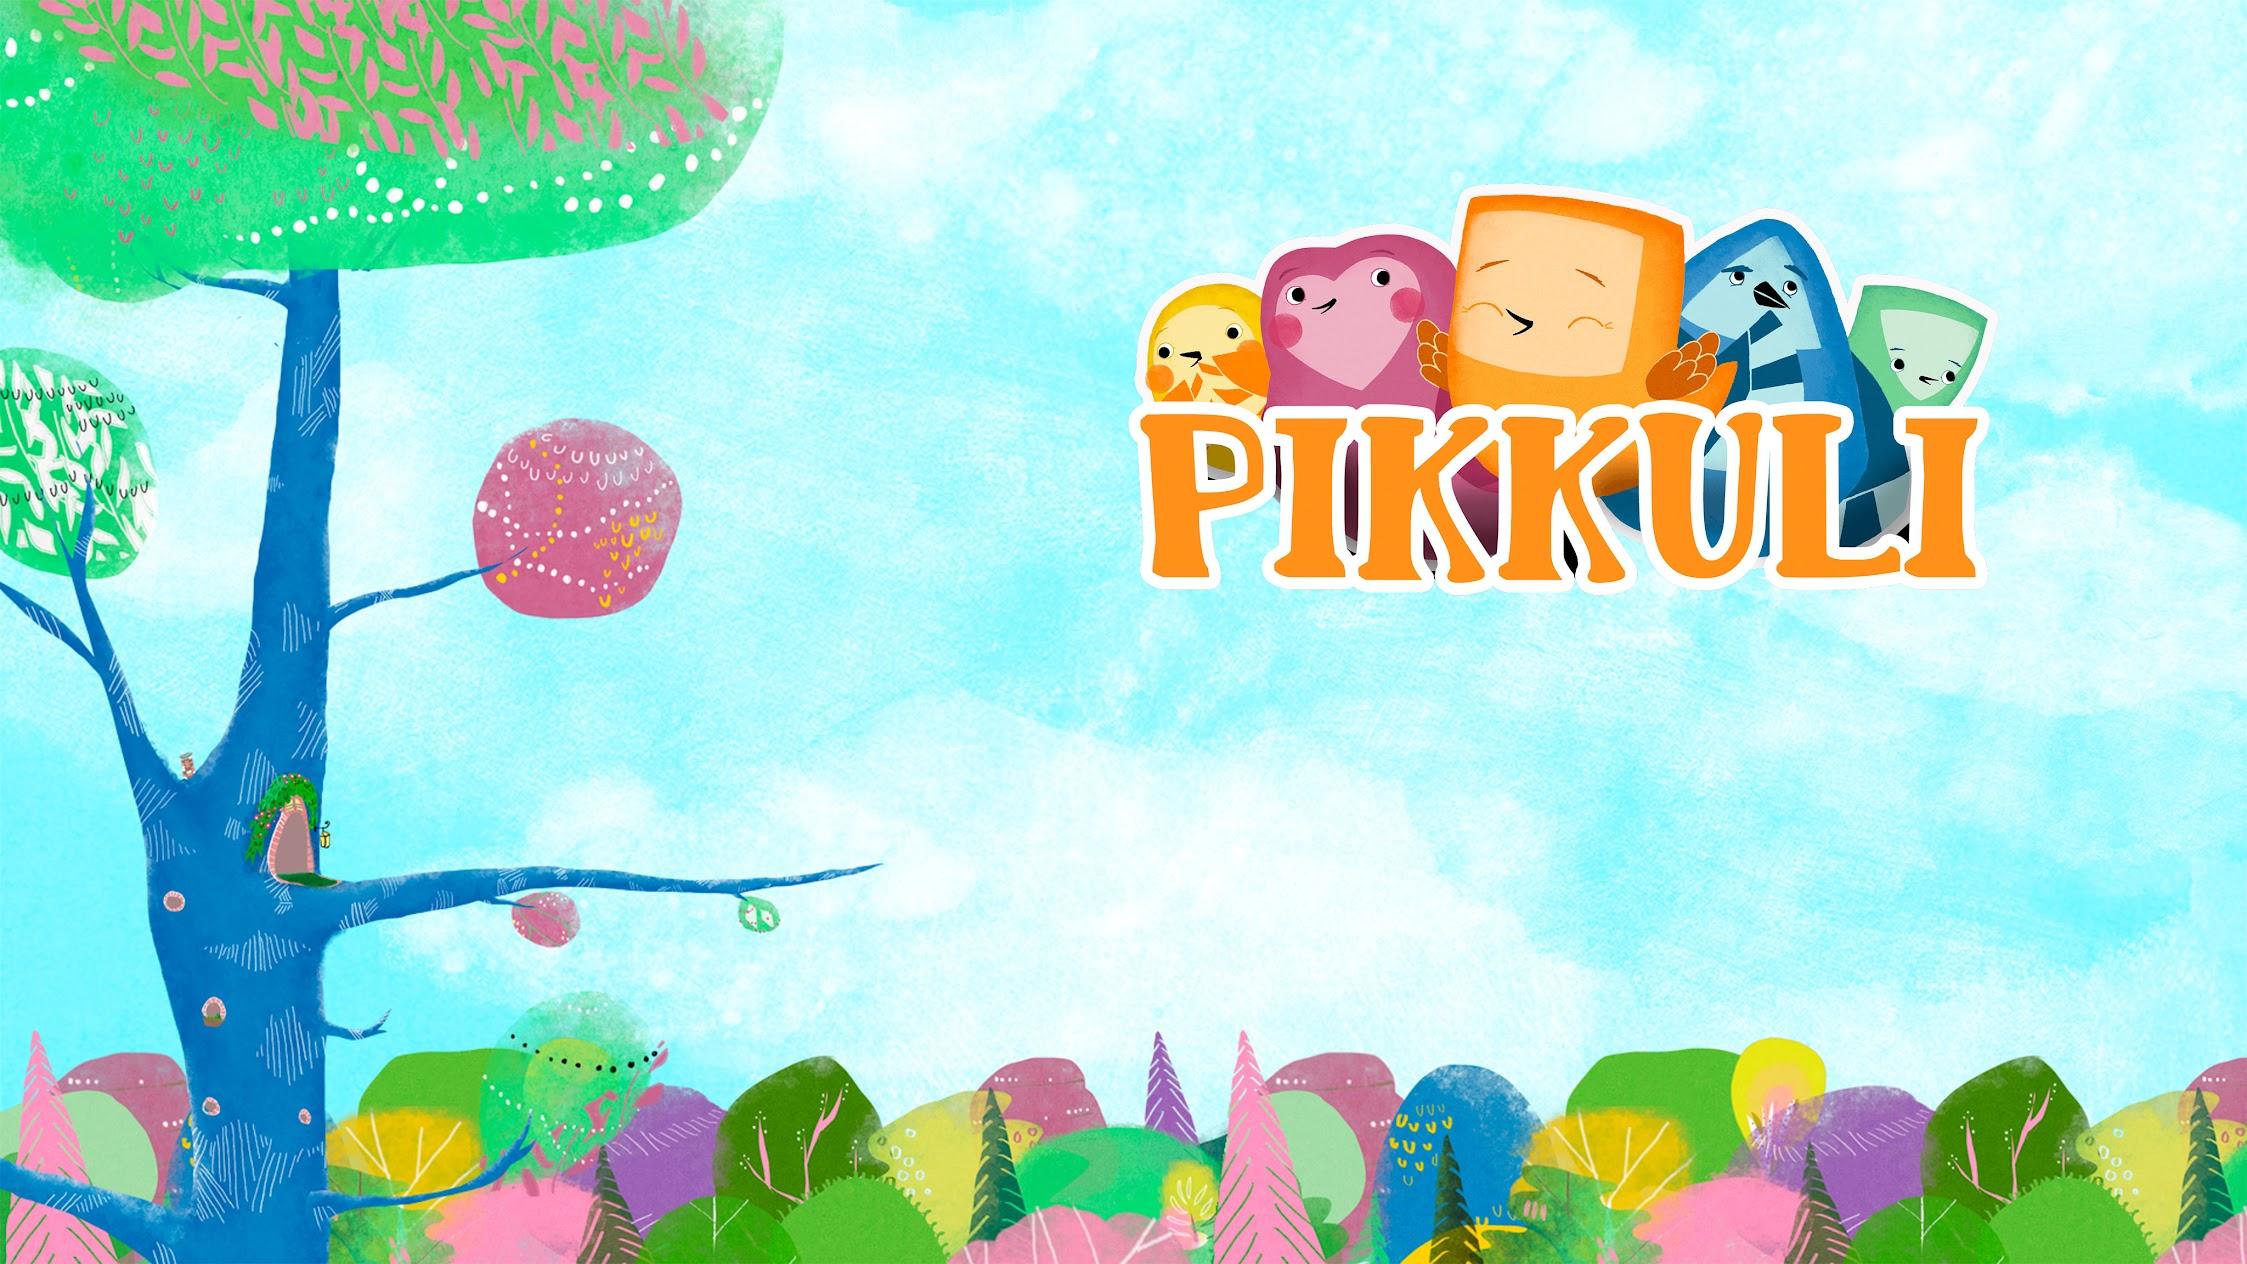 Pikkuli Games - Aittokoski Experience Ltd